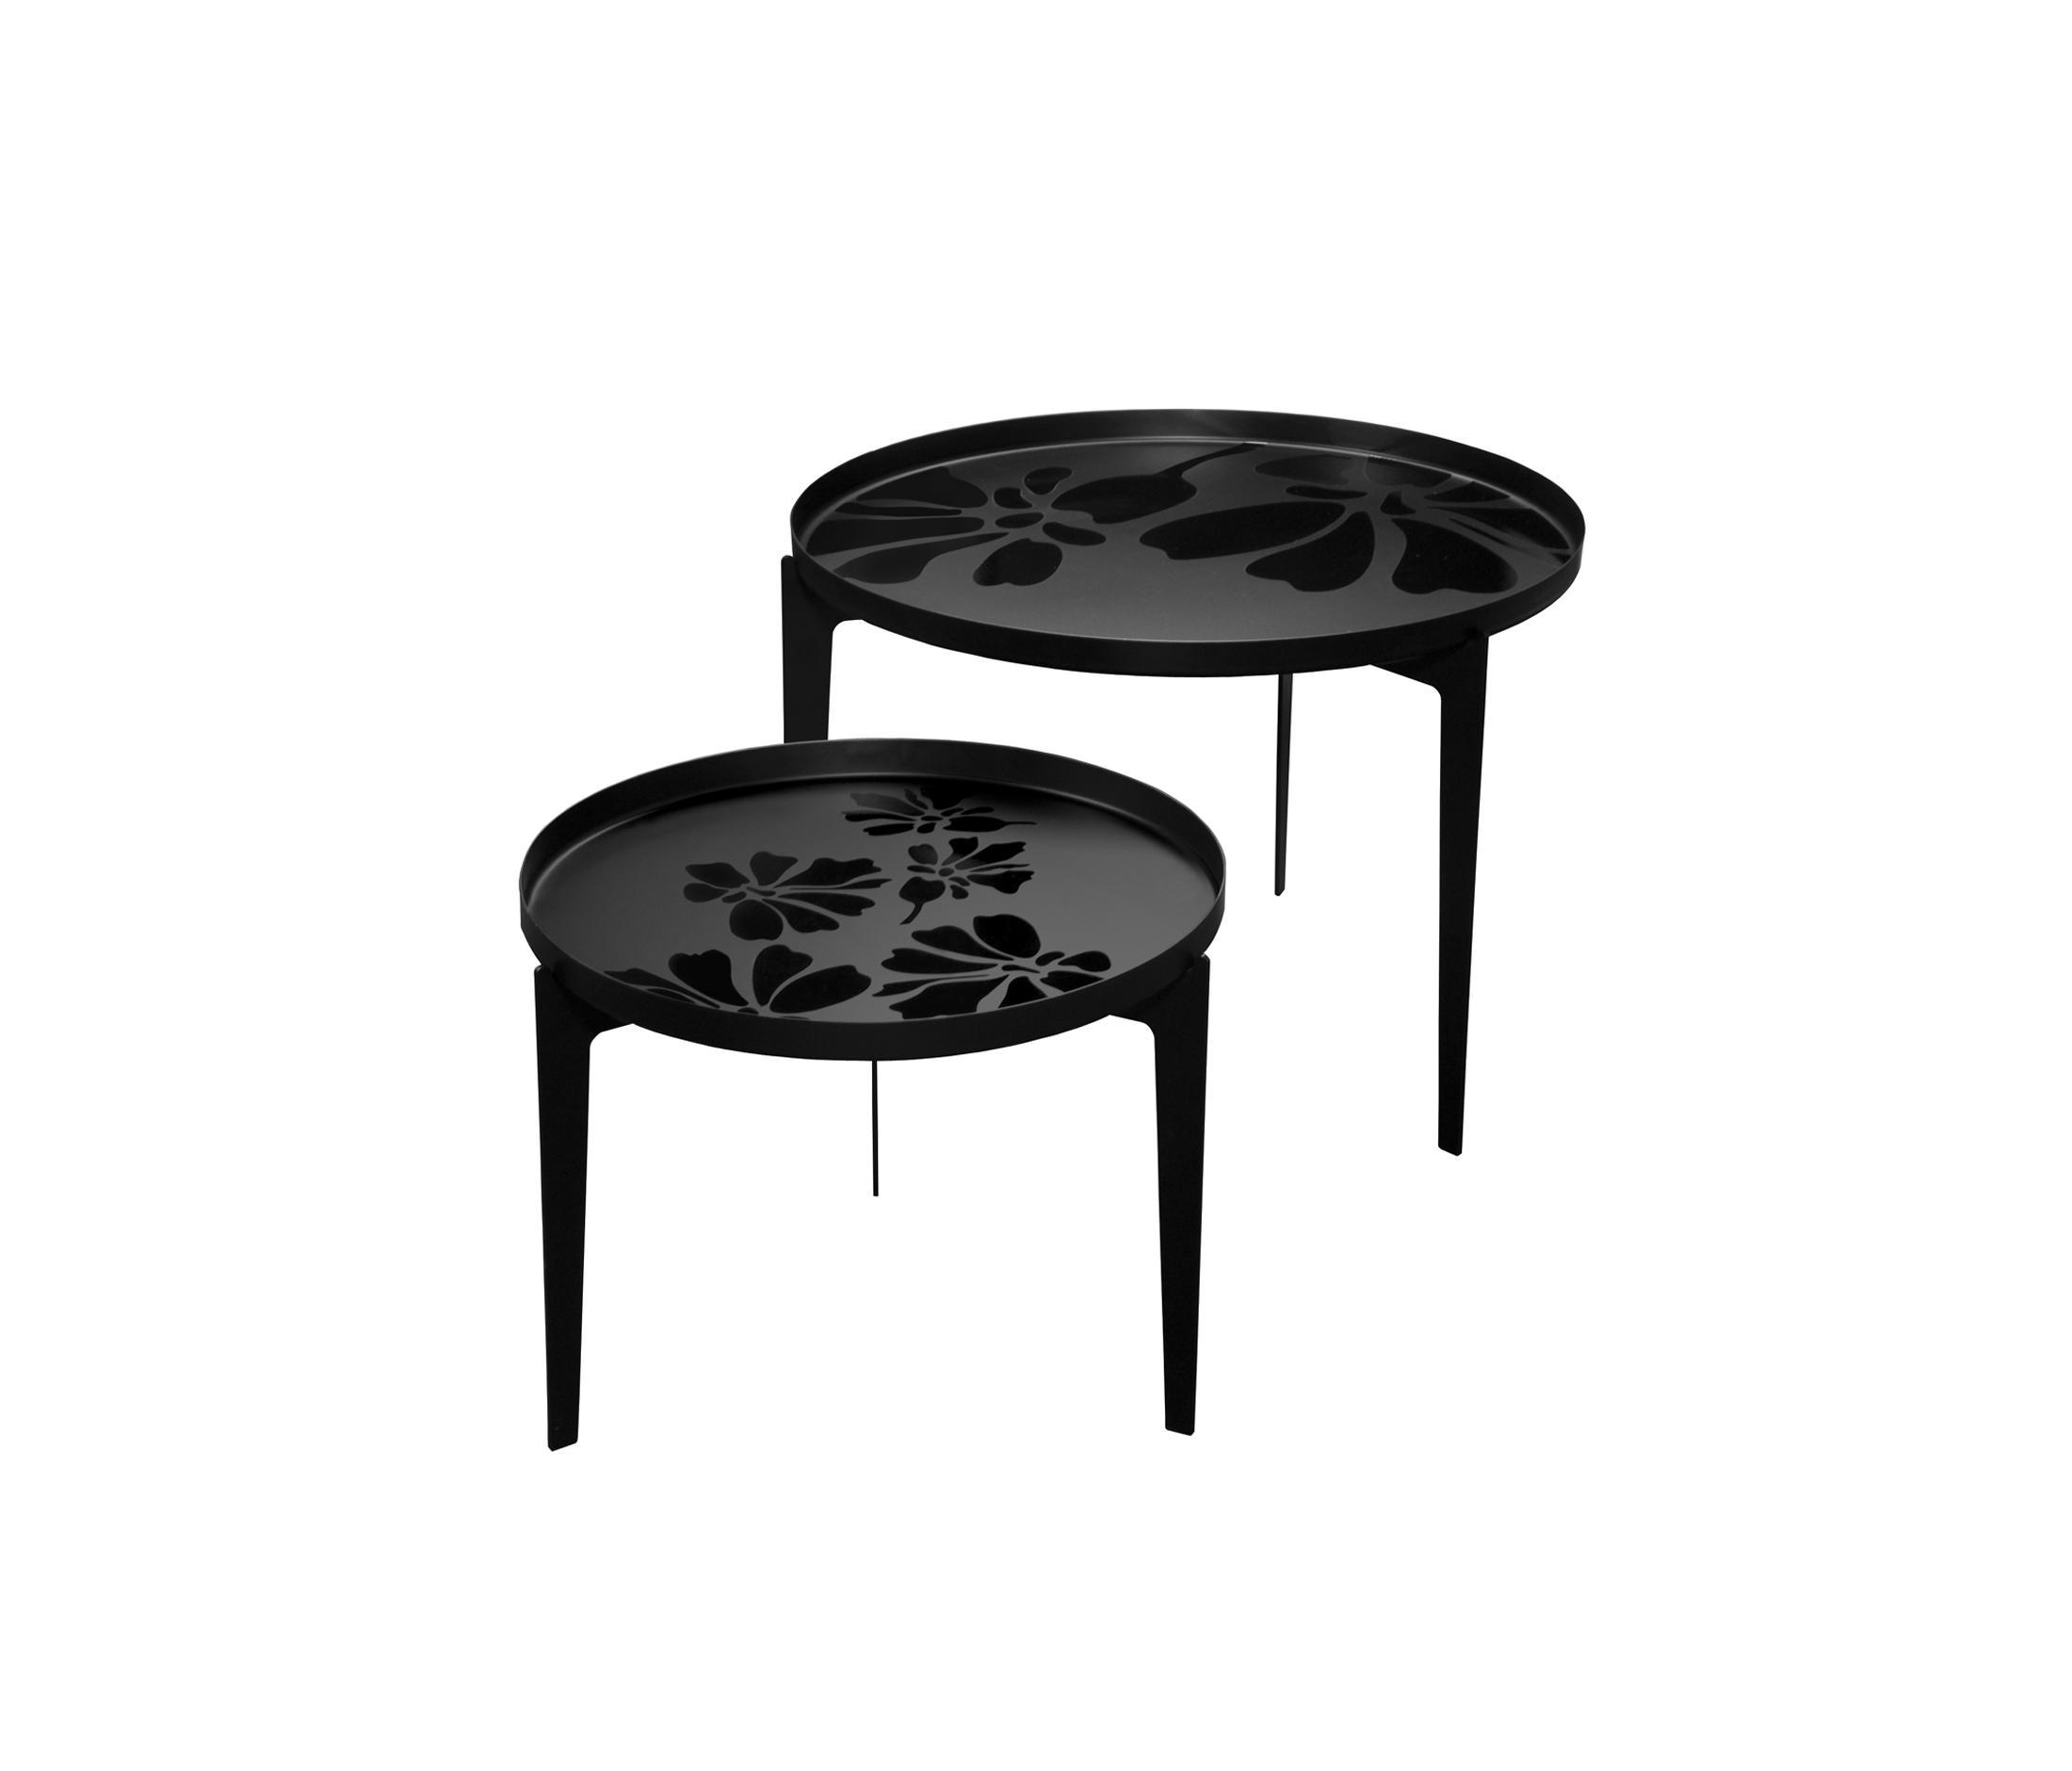 Illusion Coffe Table By Covo · Illusion Coffe Table By Covo